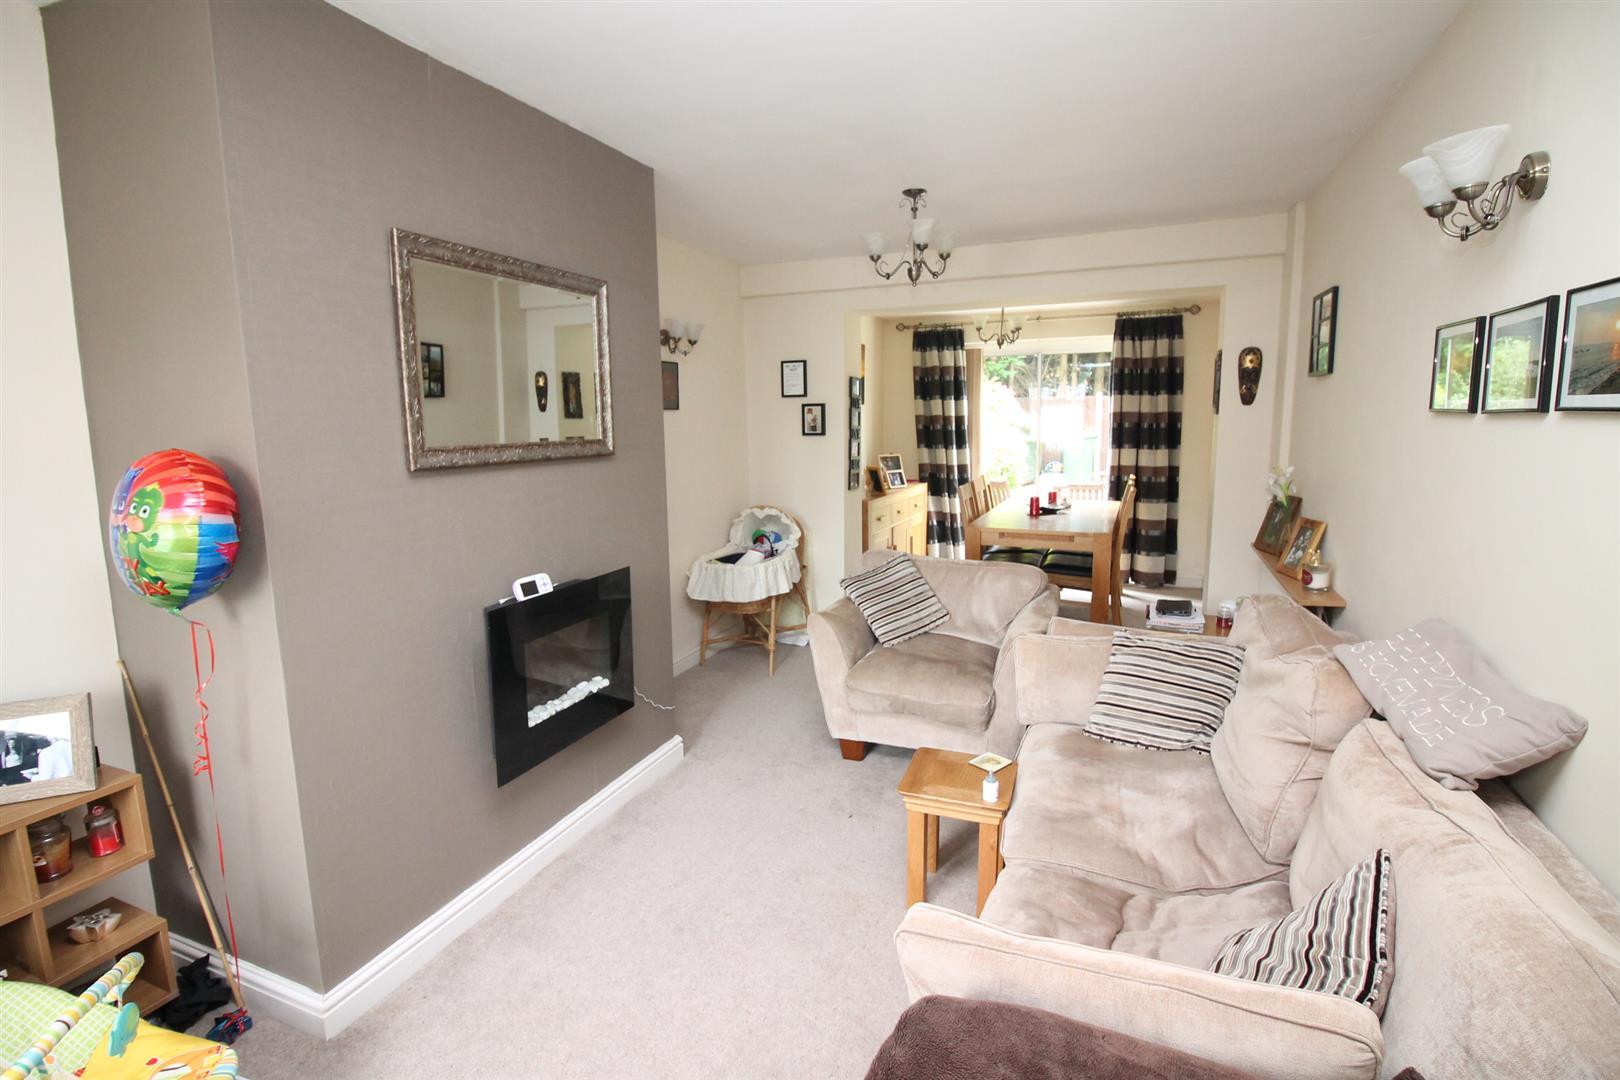 61 Living Room Estate Agents Monton 3 Bedroom House Thumbnail Studio For Sale In